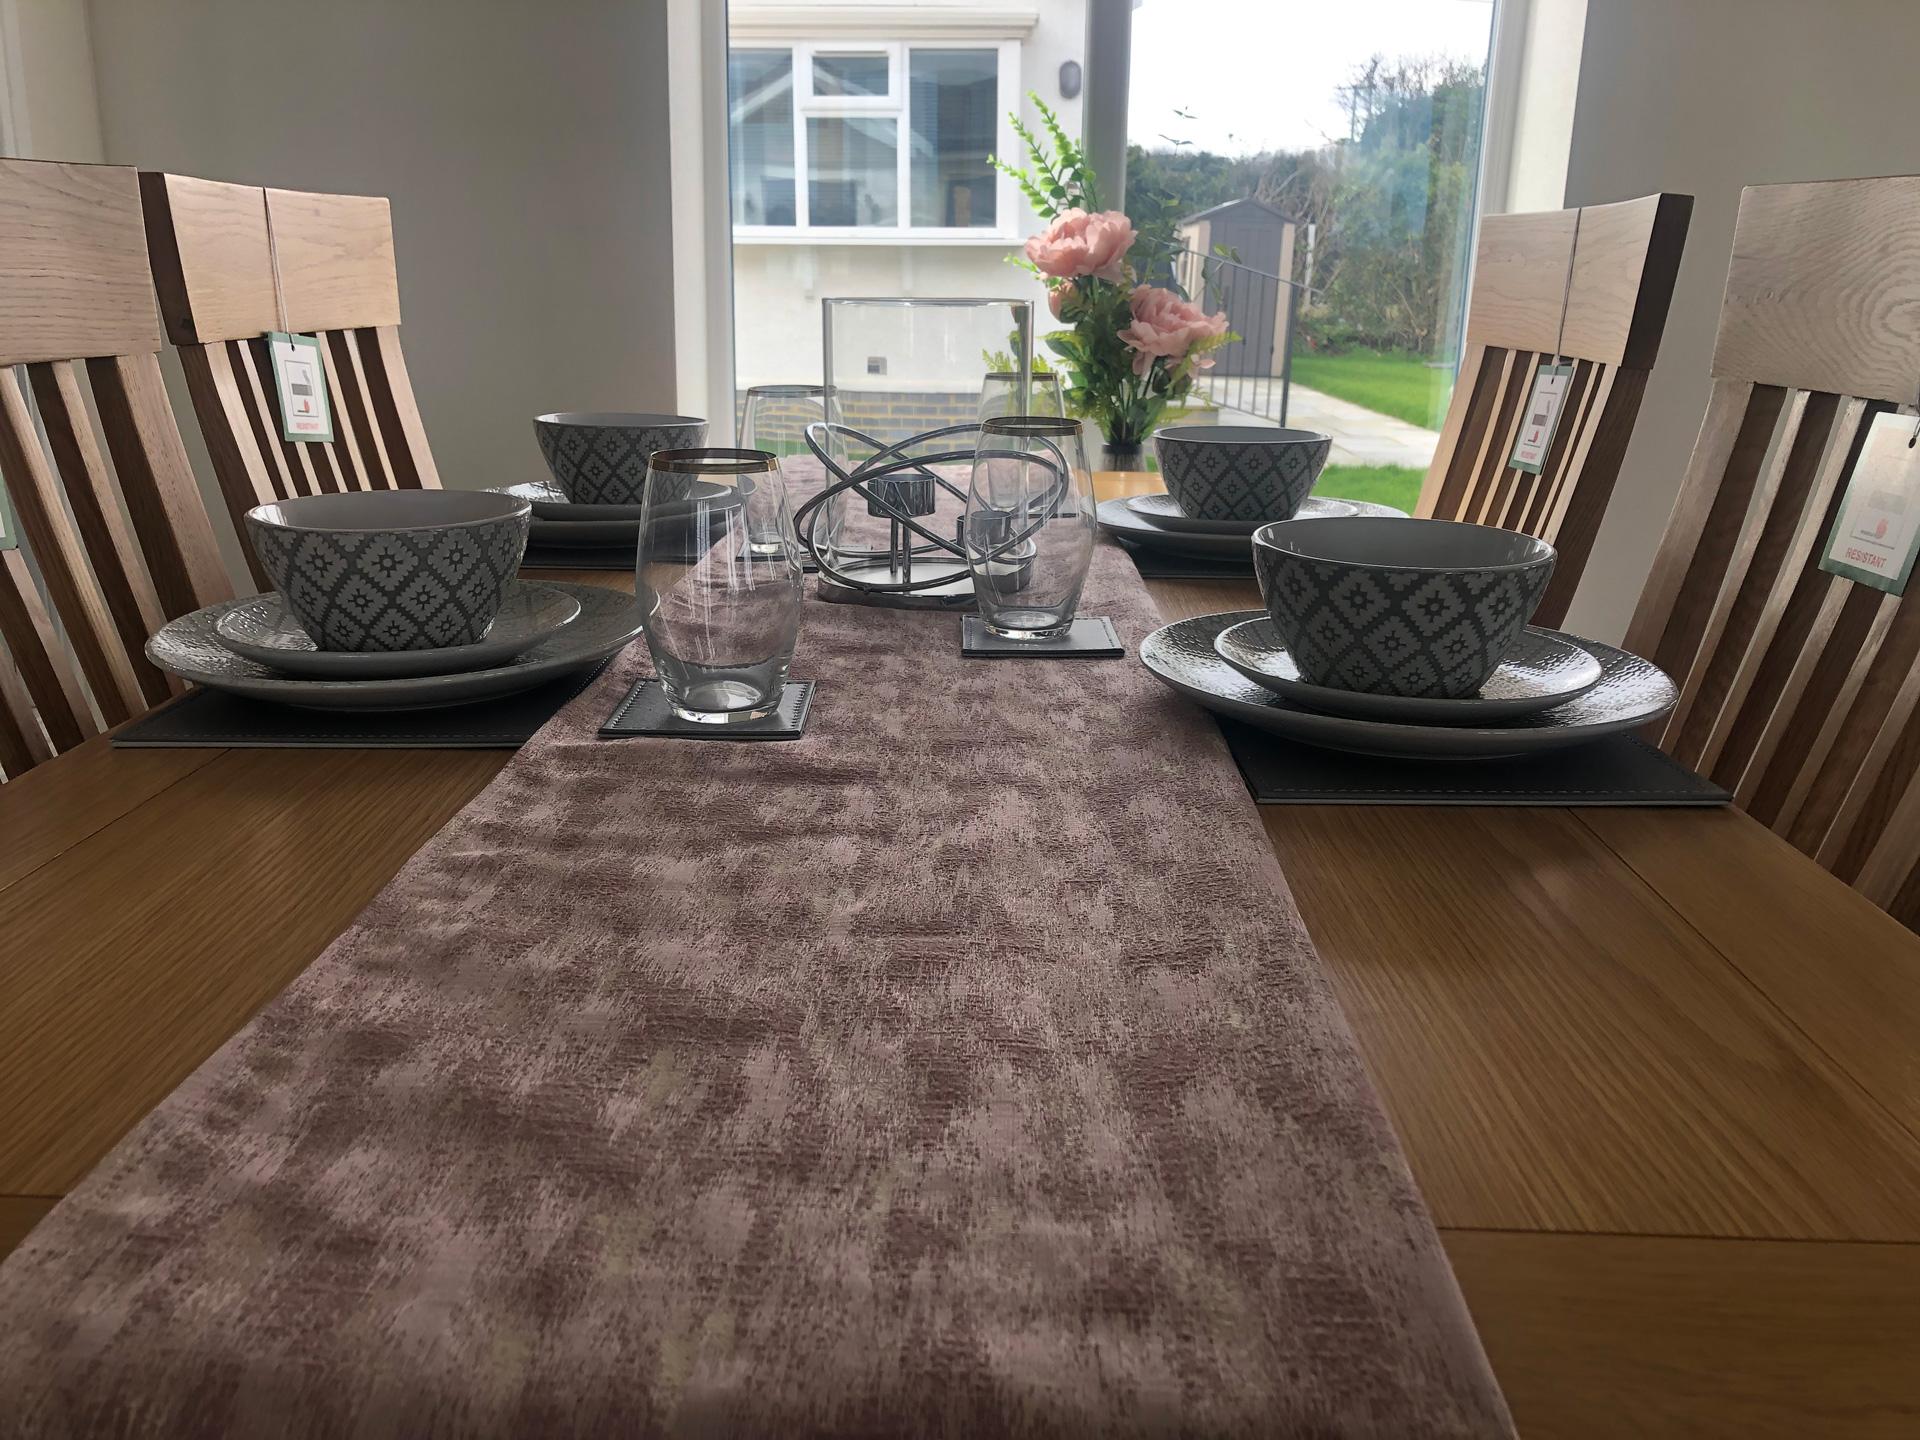 Prestige Buckland Dining